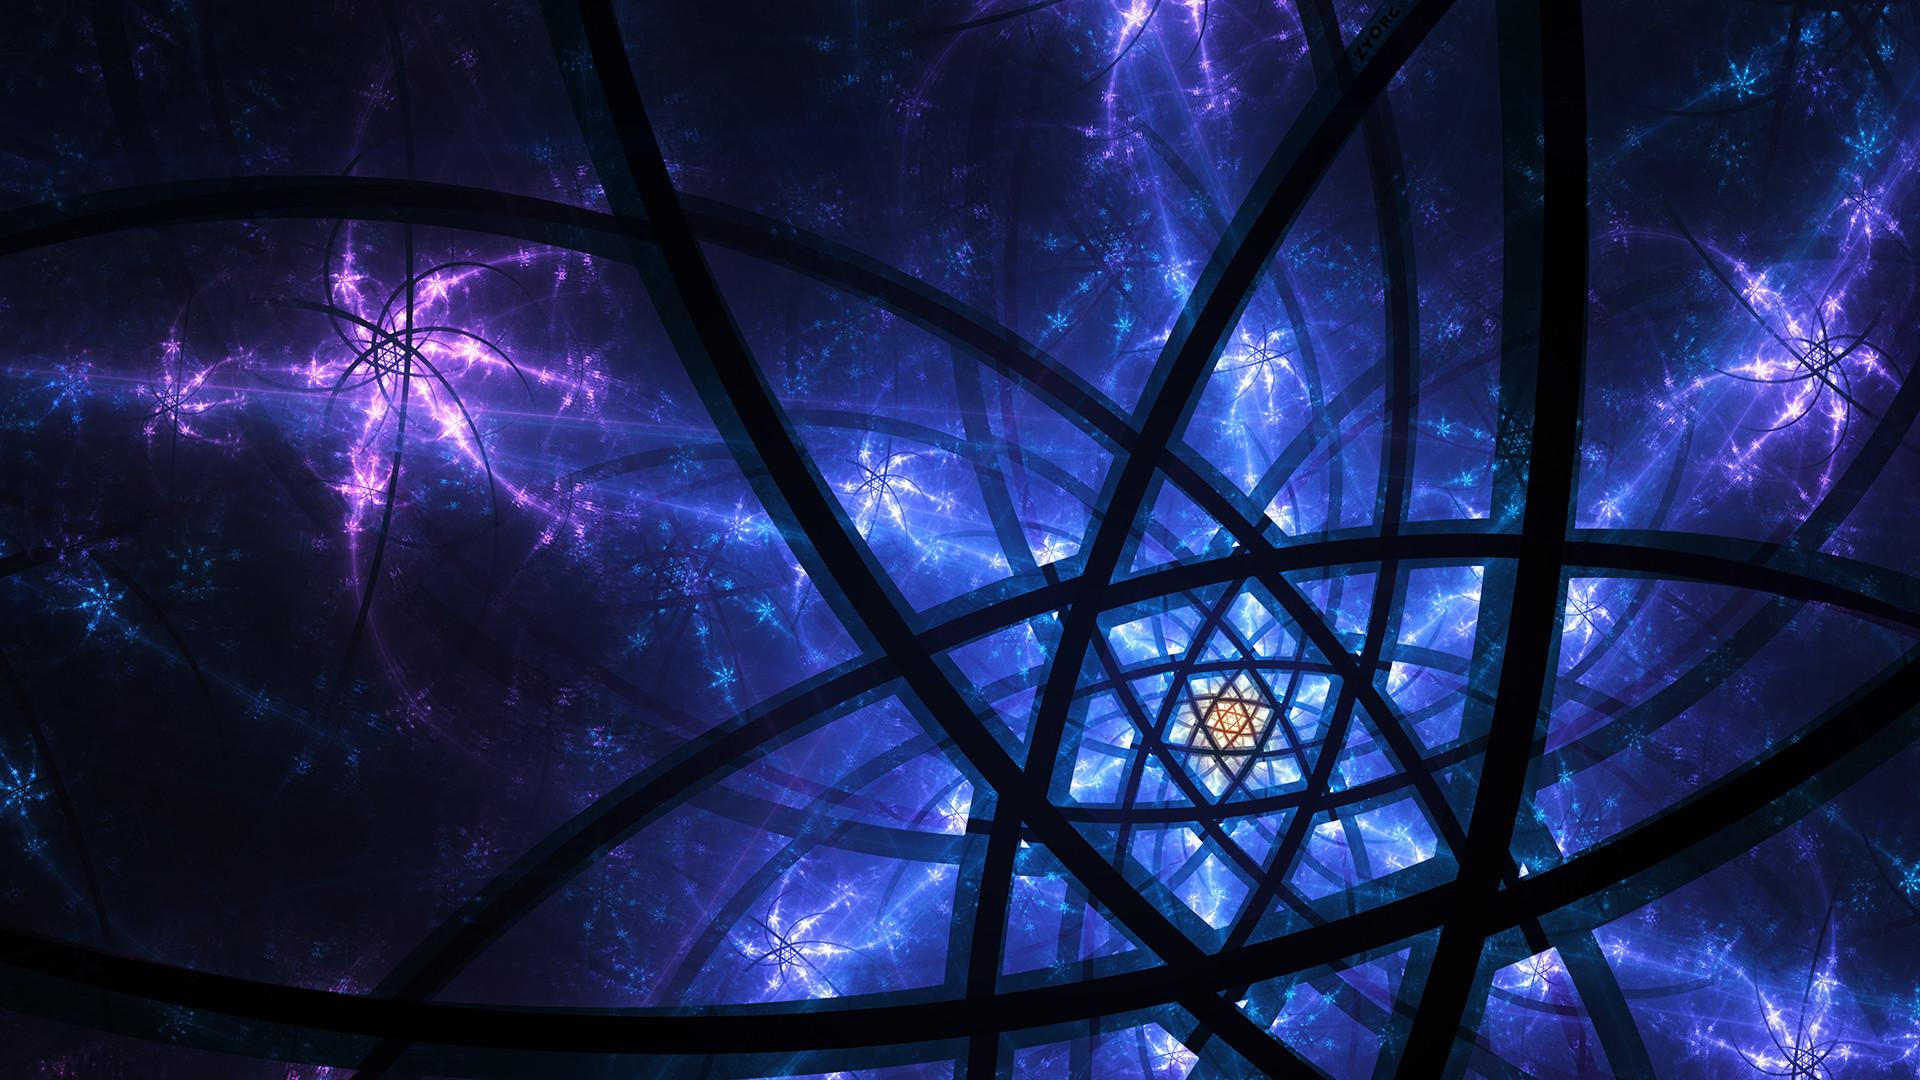 Sacred Geometry HQ Desktop Wallpaper 23263 – Baltana